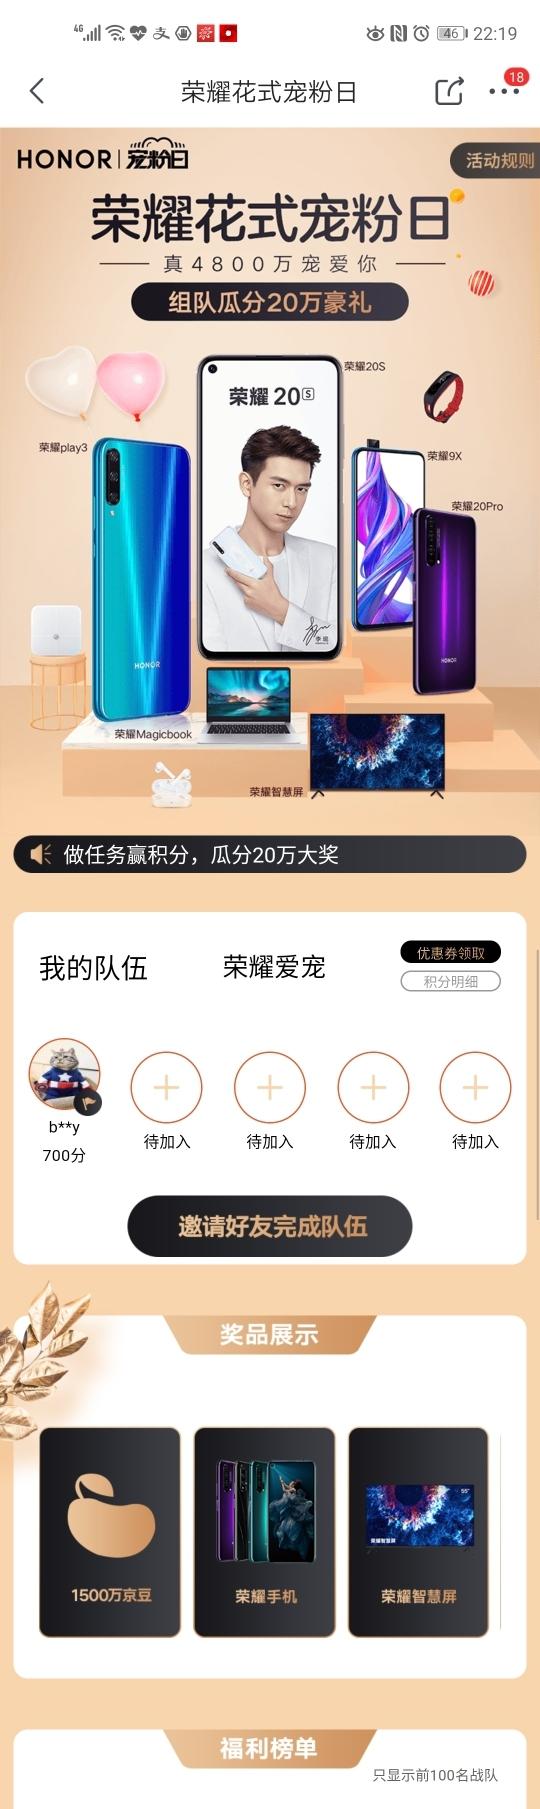 Screenshot_20190918_221937_com.jingdong.app.mall.jpg